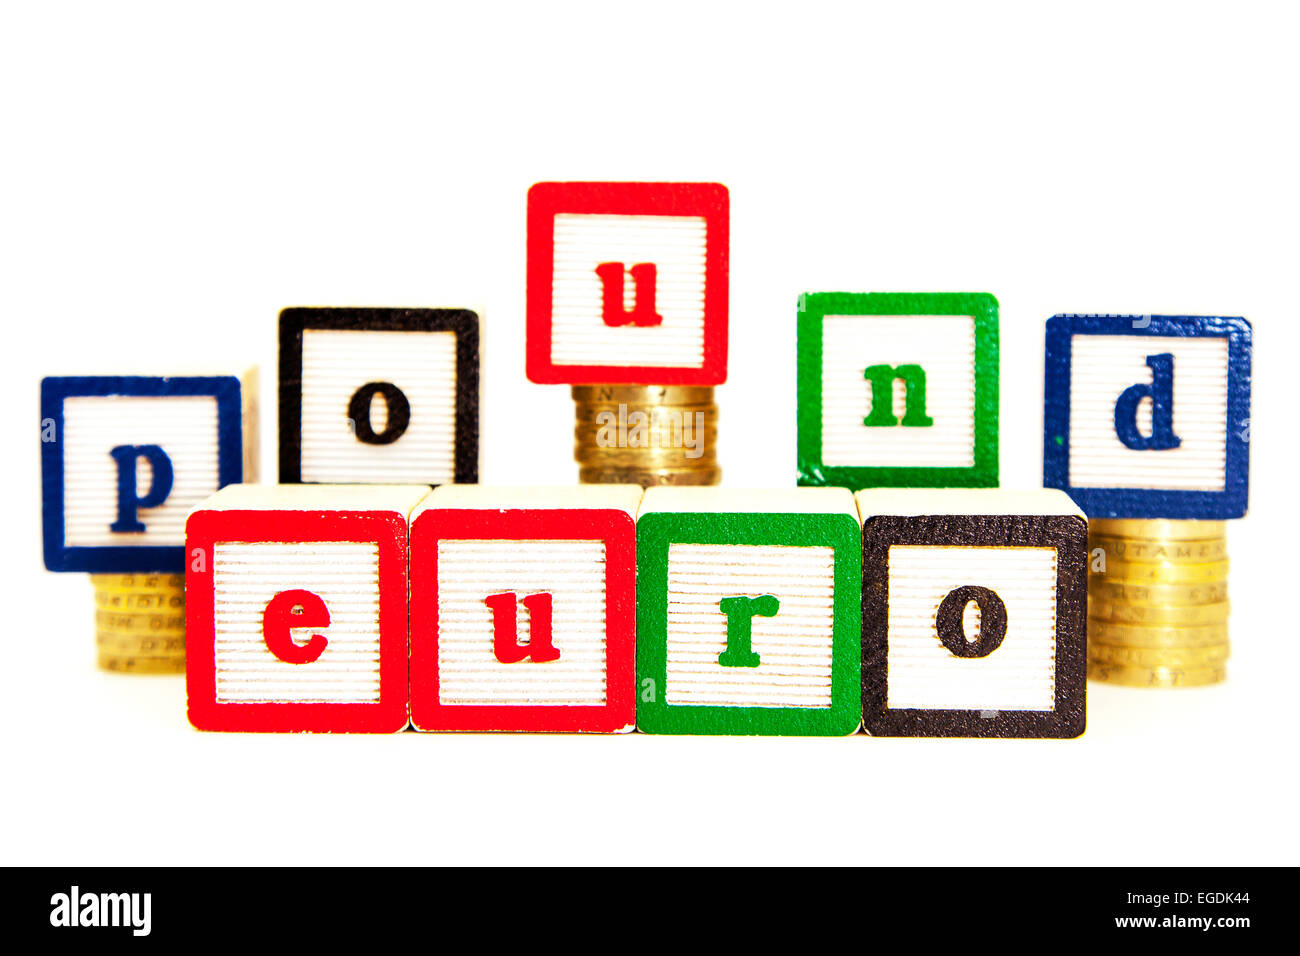 Libra vs euro tasas cambiarias monedas pounds euros recorte recorte espacio copia fondo blanco Foto de stock